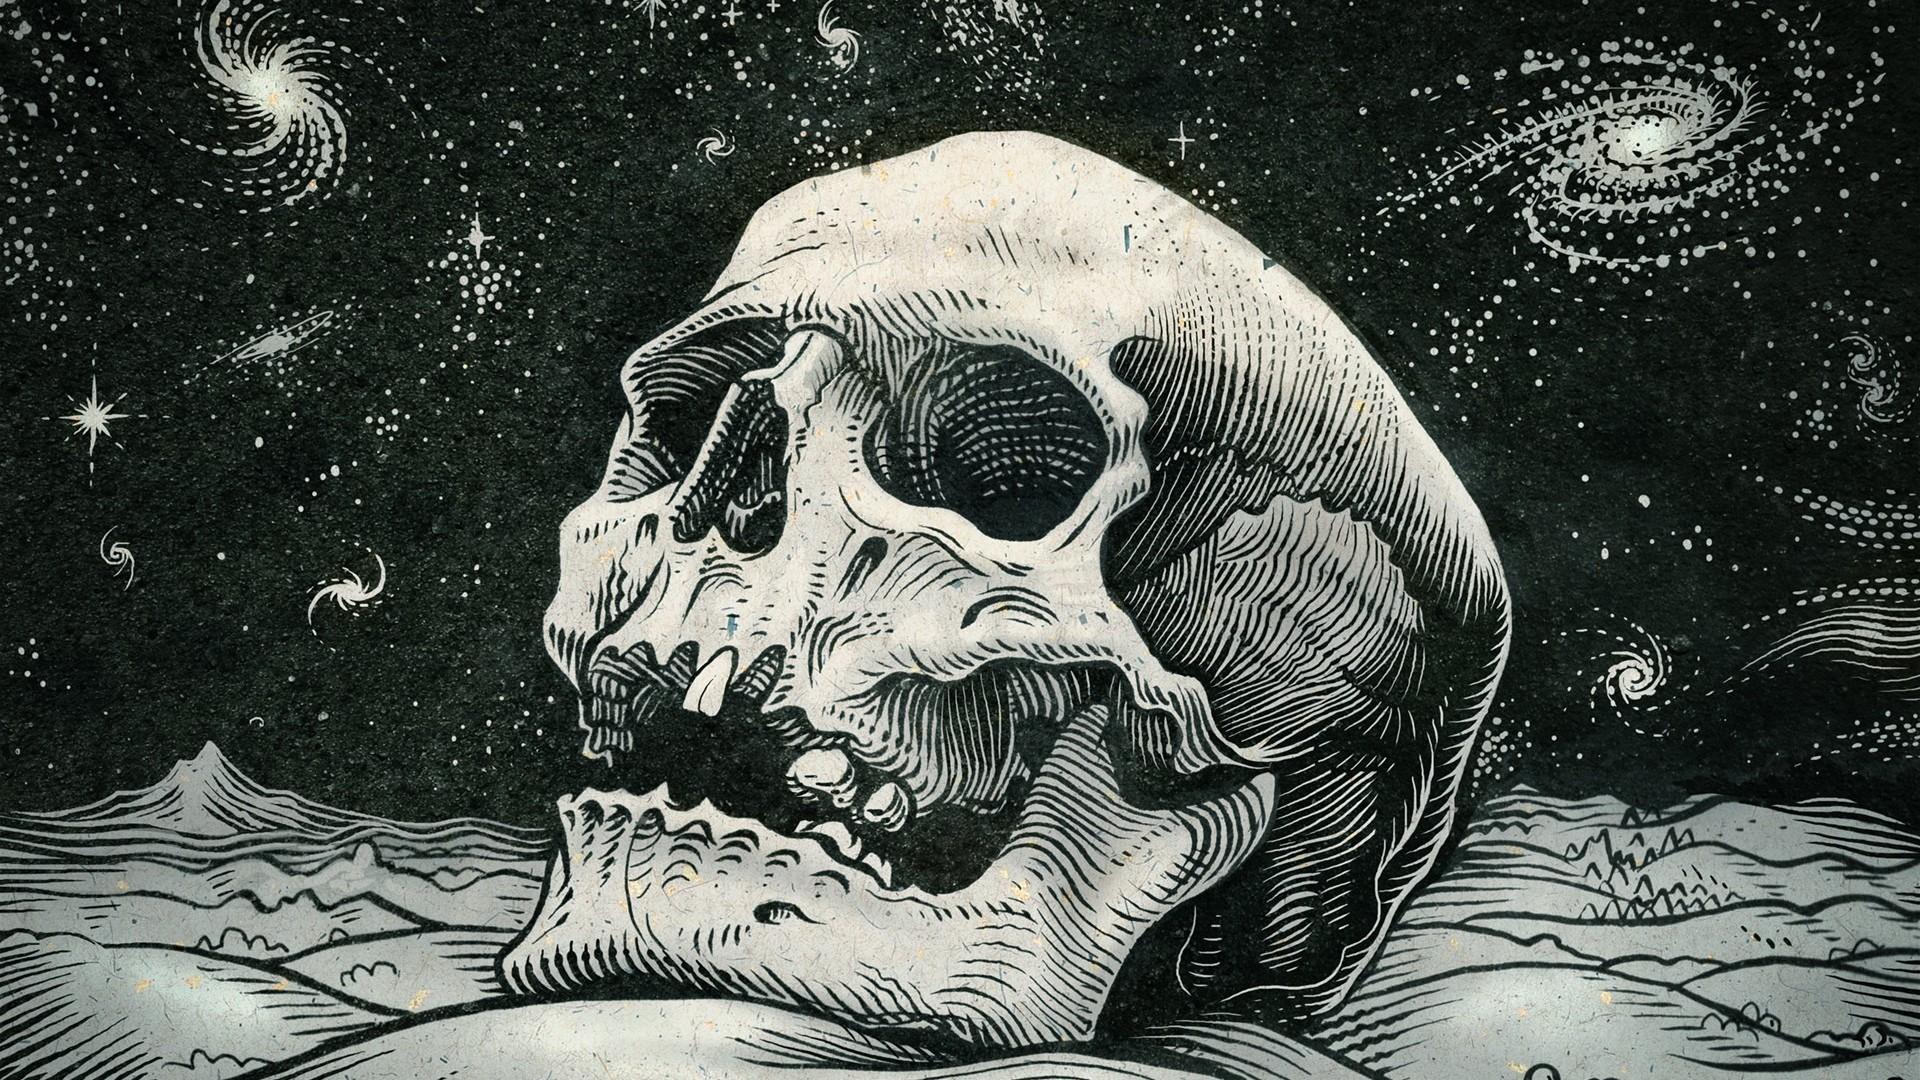 Pentagram wallpaper hd 58 images - Skeleton wallpaper ...